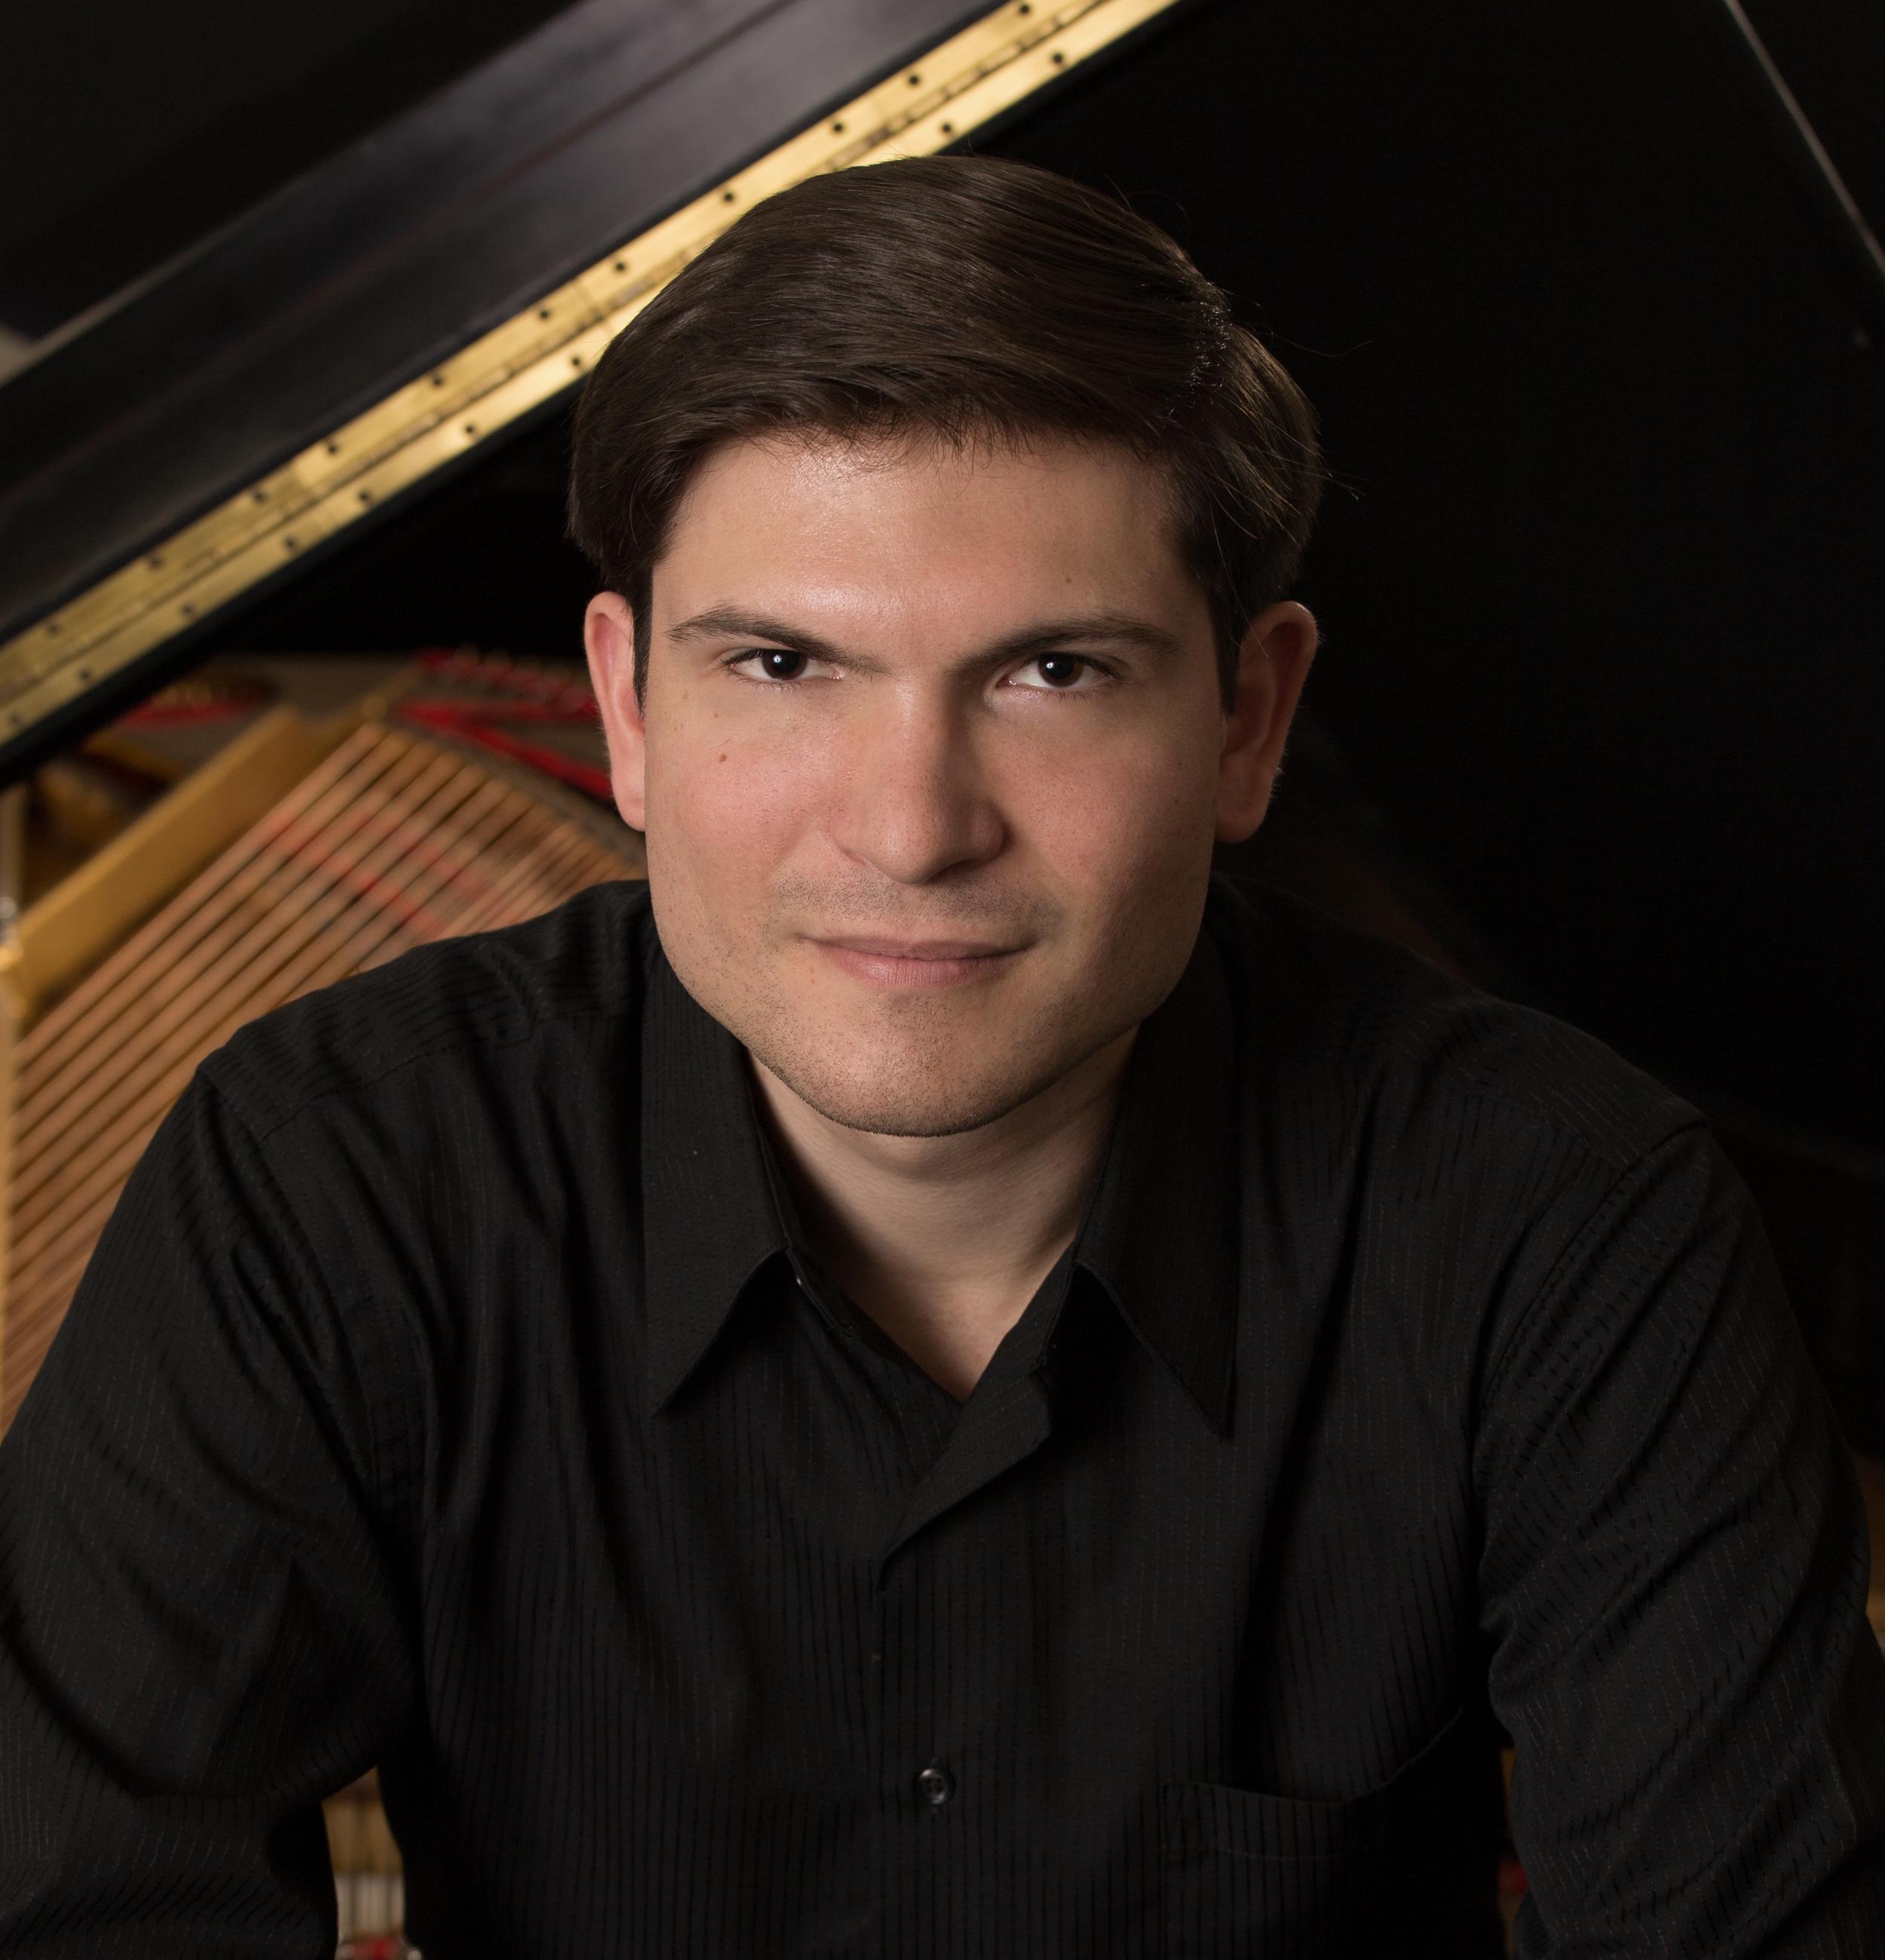 Patricio Molina, Music Theory, Piano, Associate Director, Conservatory Division